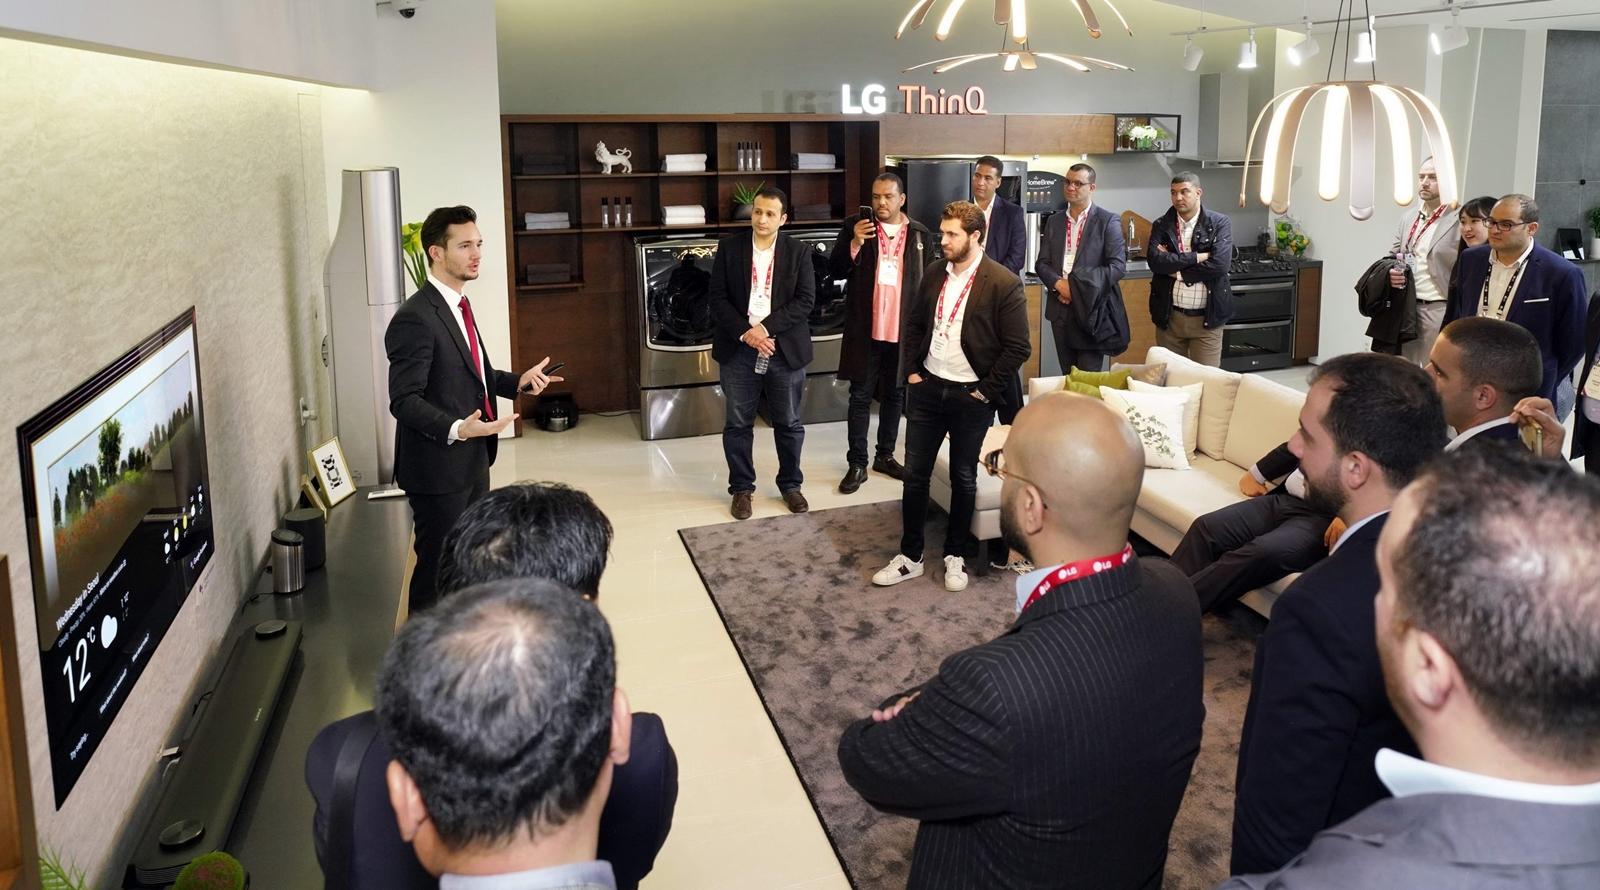 LG전자는 9일부터 11일까지 중동∙아프리카의 주요 거래선, 외신기자 등 약 200명을 한국으로 초청해 'LG 이노페스트'를 열었다. LG 이노페스트 참가자들이 인공지능 'LG 씽큐(LG ThinQ)'를 체험하고 있다.